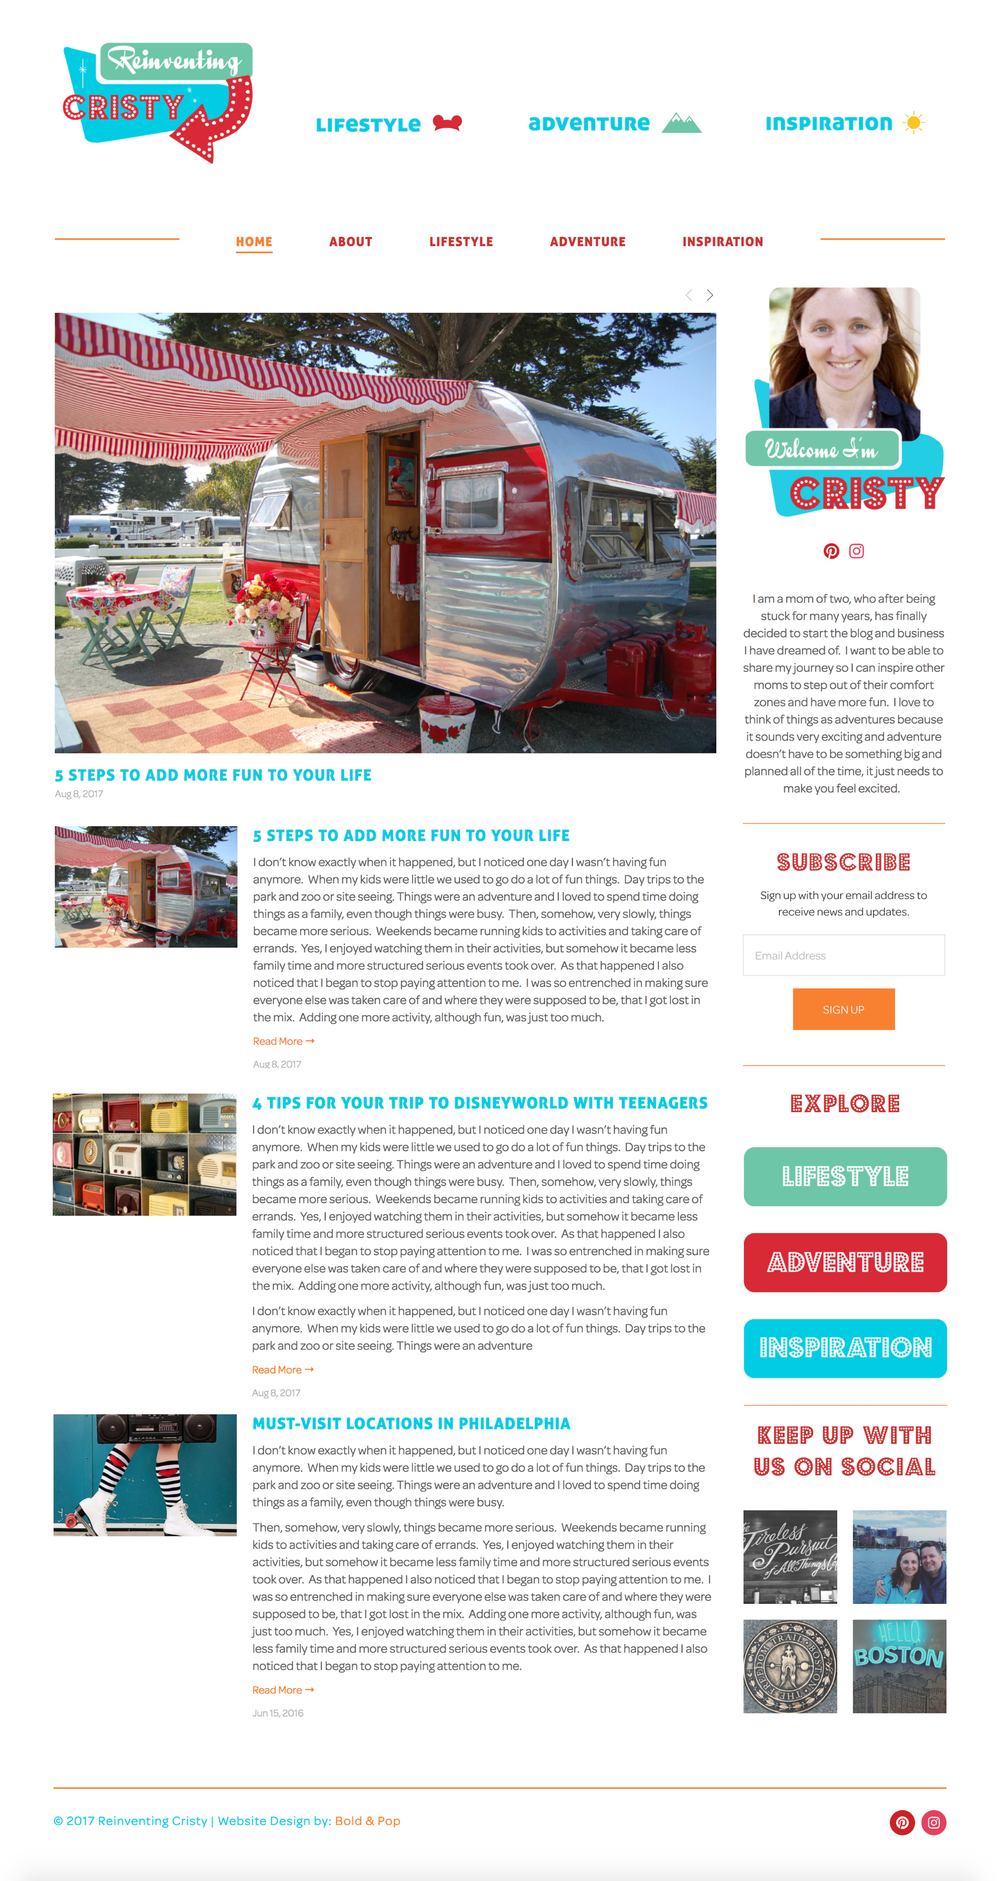 Lifestyle Blogger Branding & Website Design